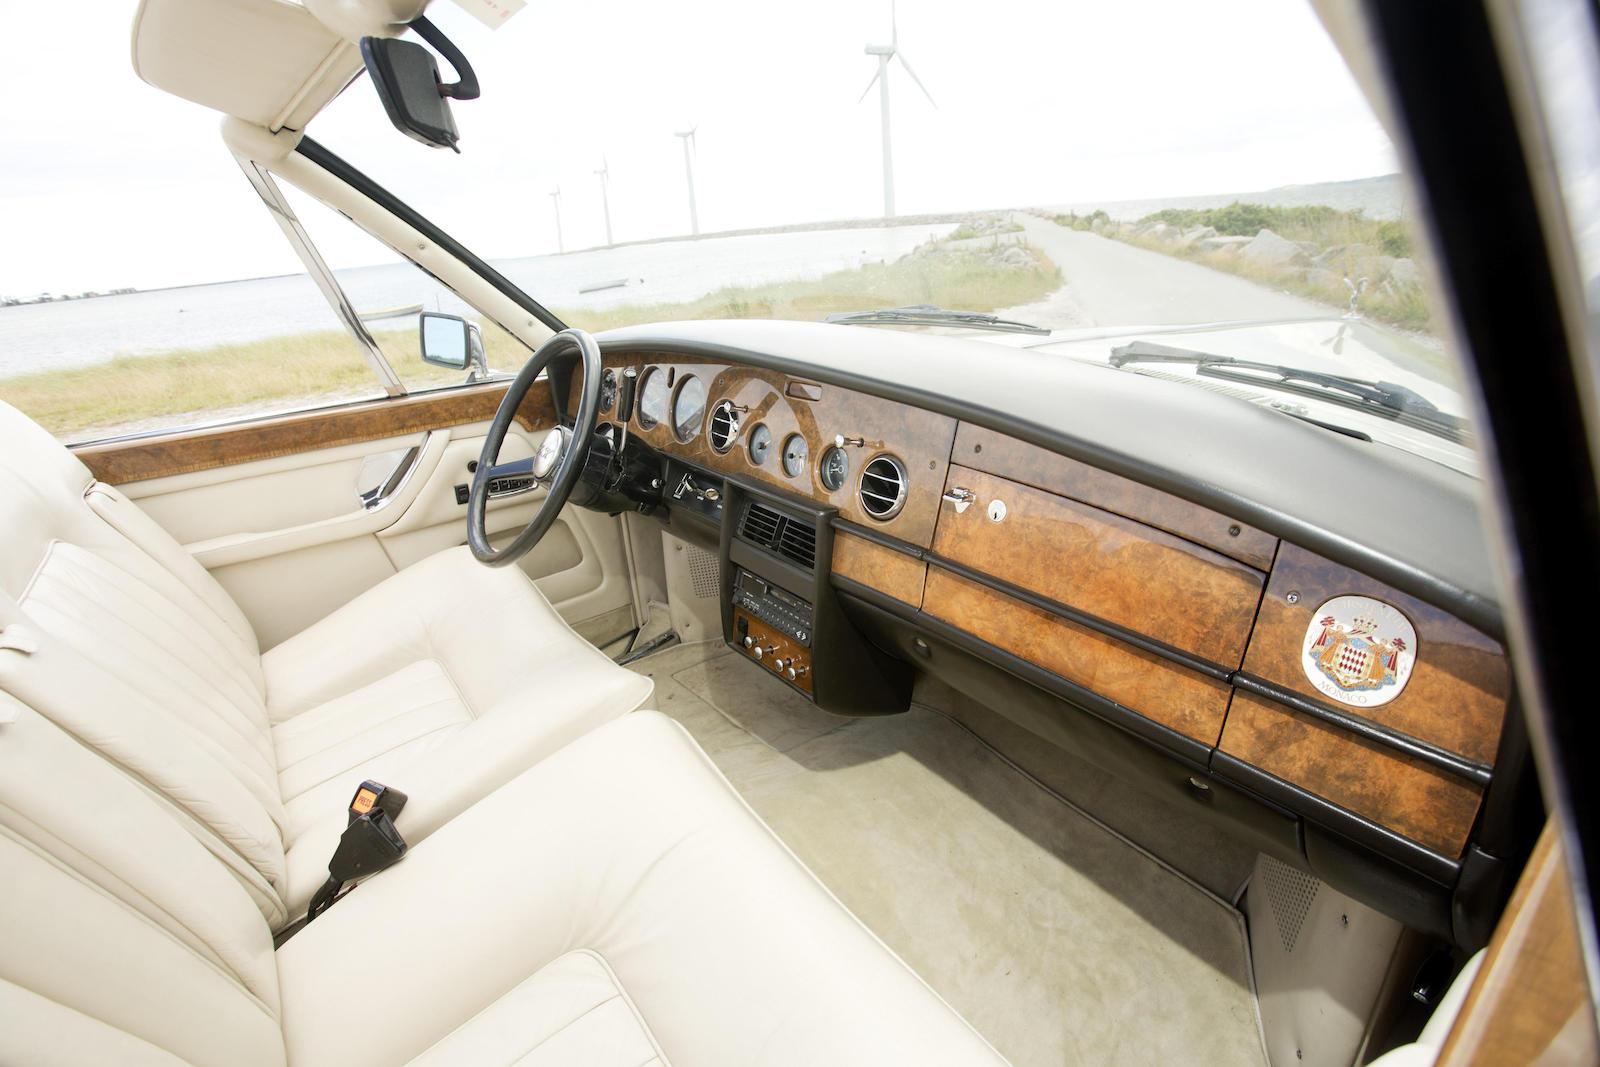 1973-Rolls-Royce-Phantom-VI-Drophead-Coupe-by-Frua-Interior-01